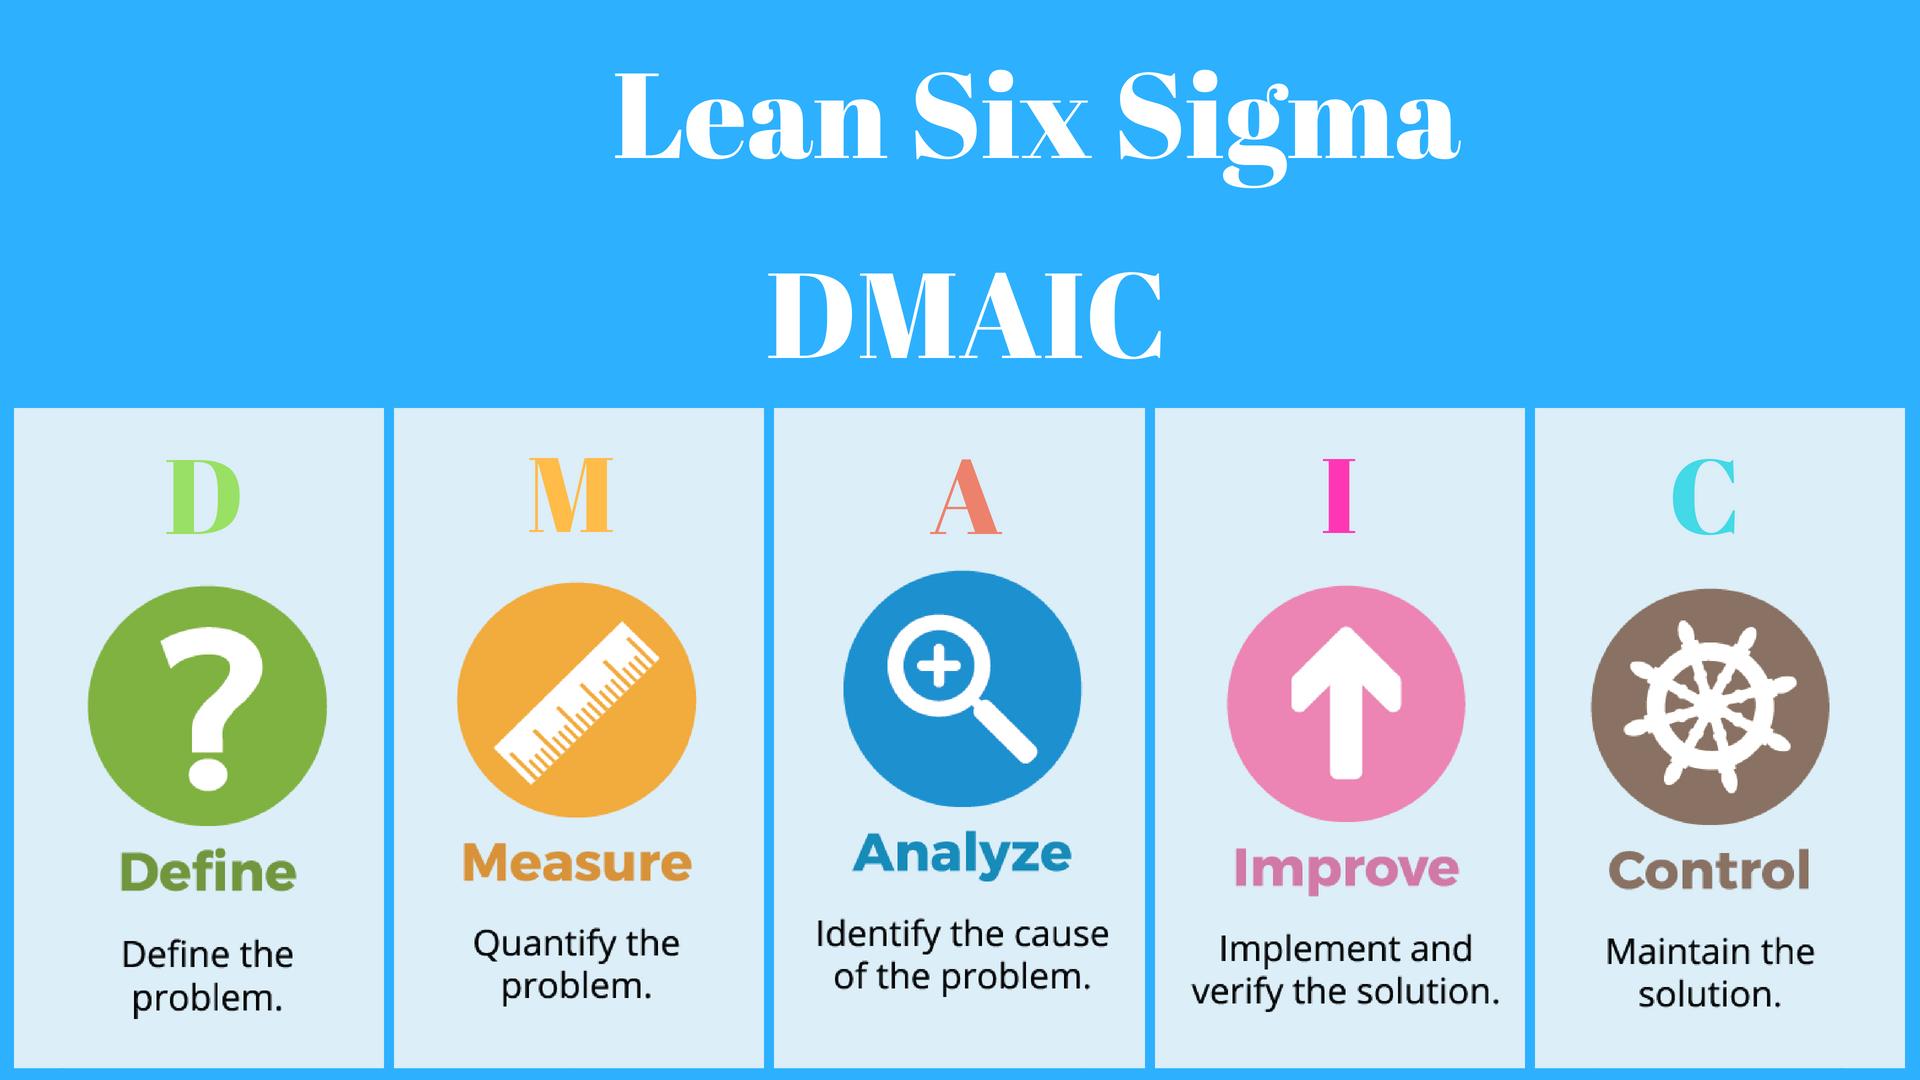 Dmaic Approach In Lean Six Sigma